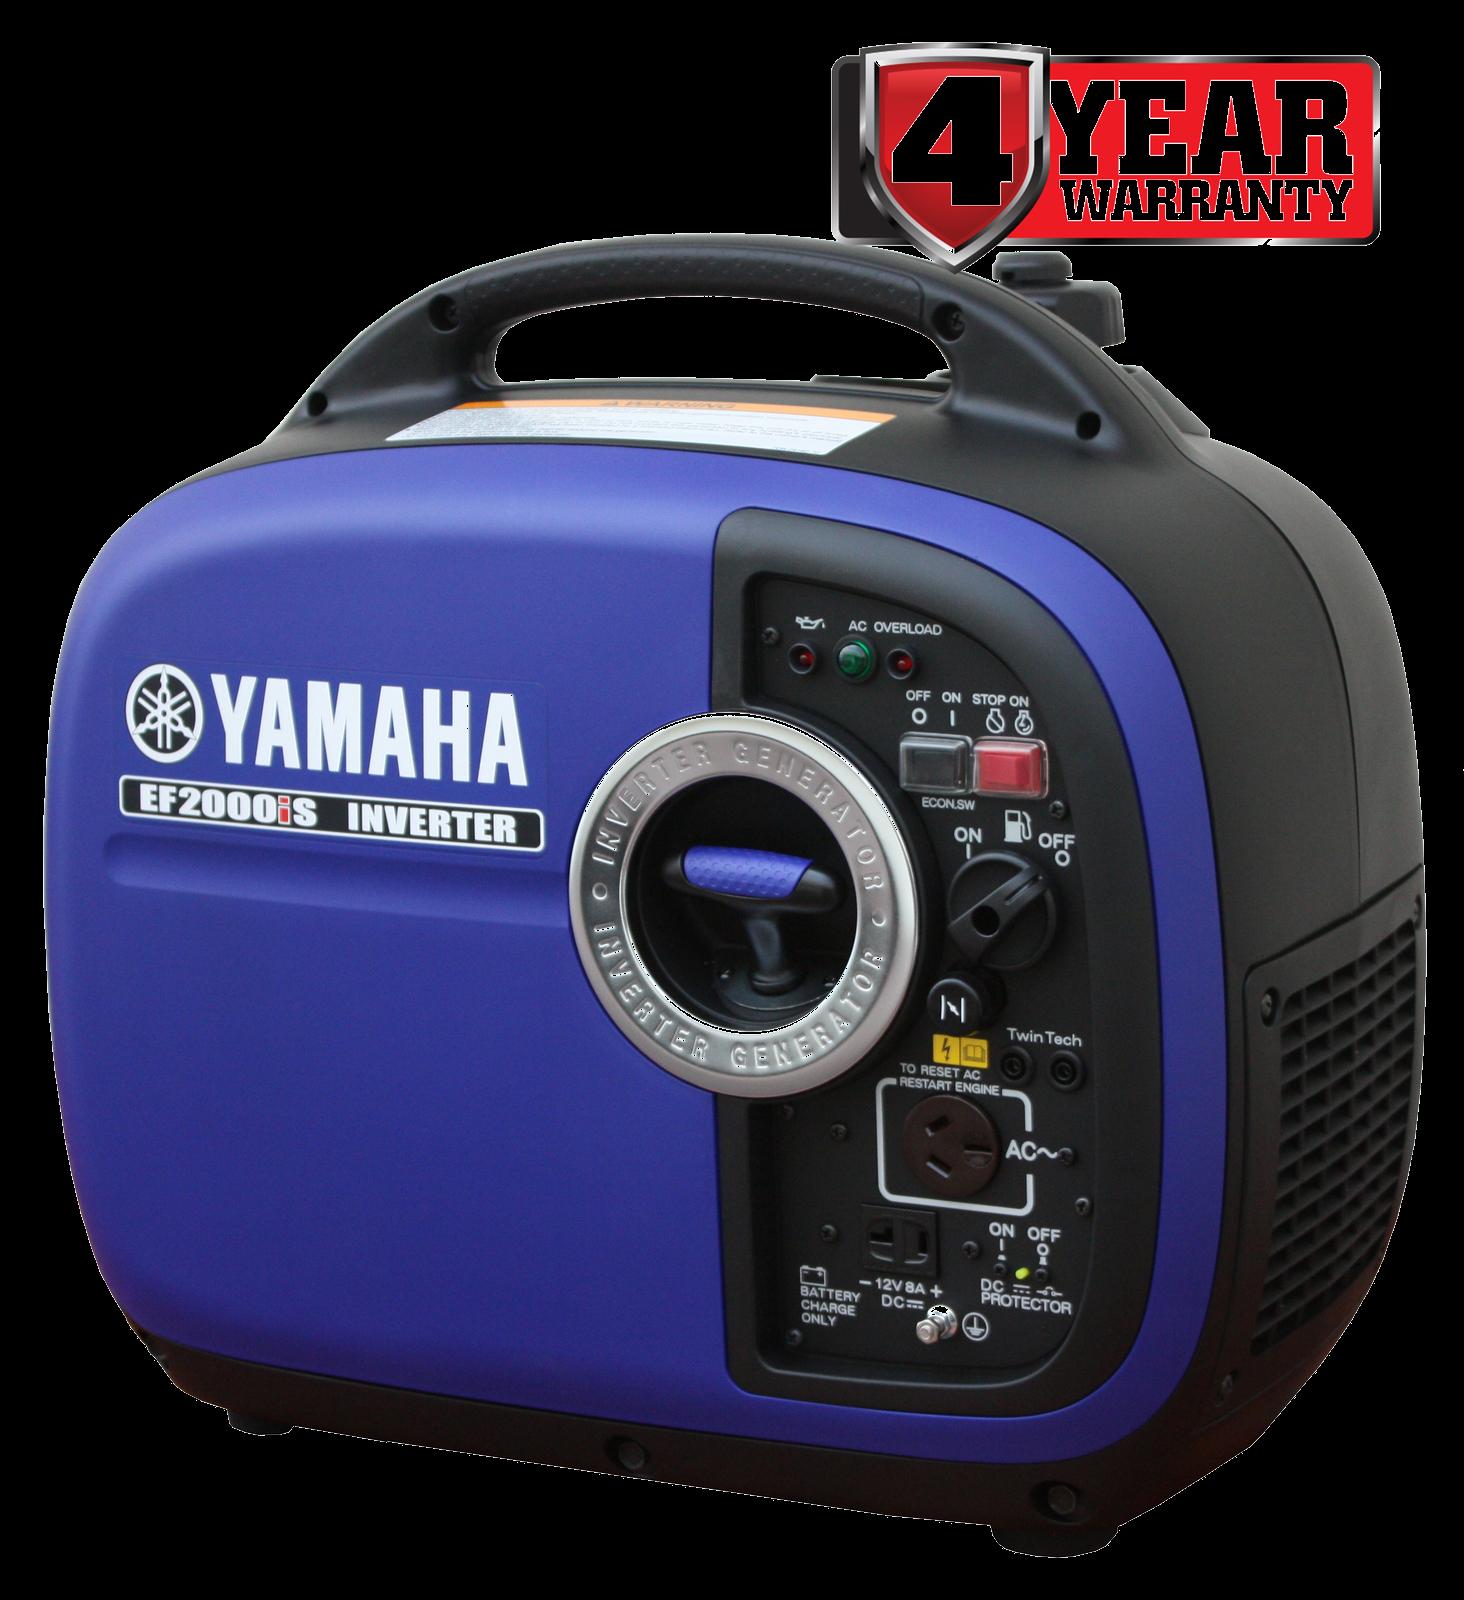 Yamaha Generator Inverter Petrol Yamaha 2Kva - Ef2000is